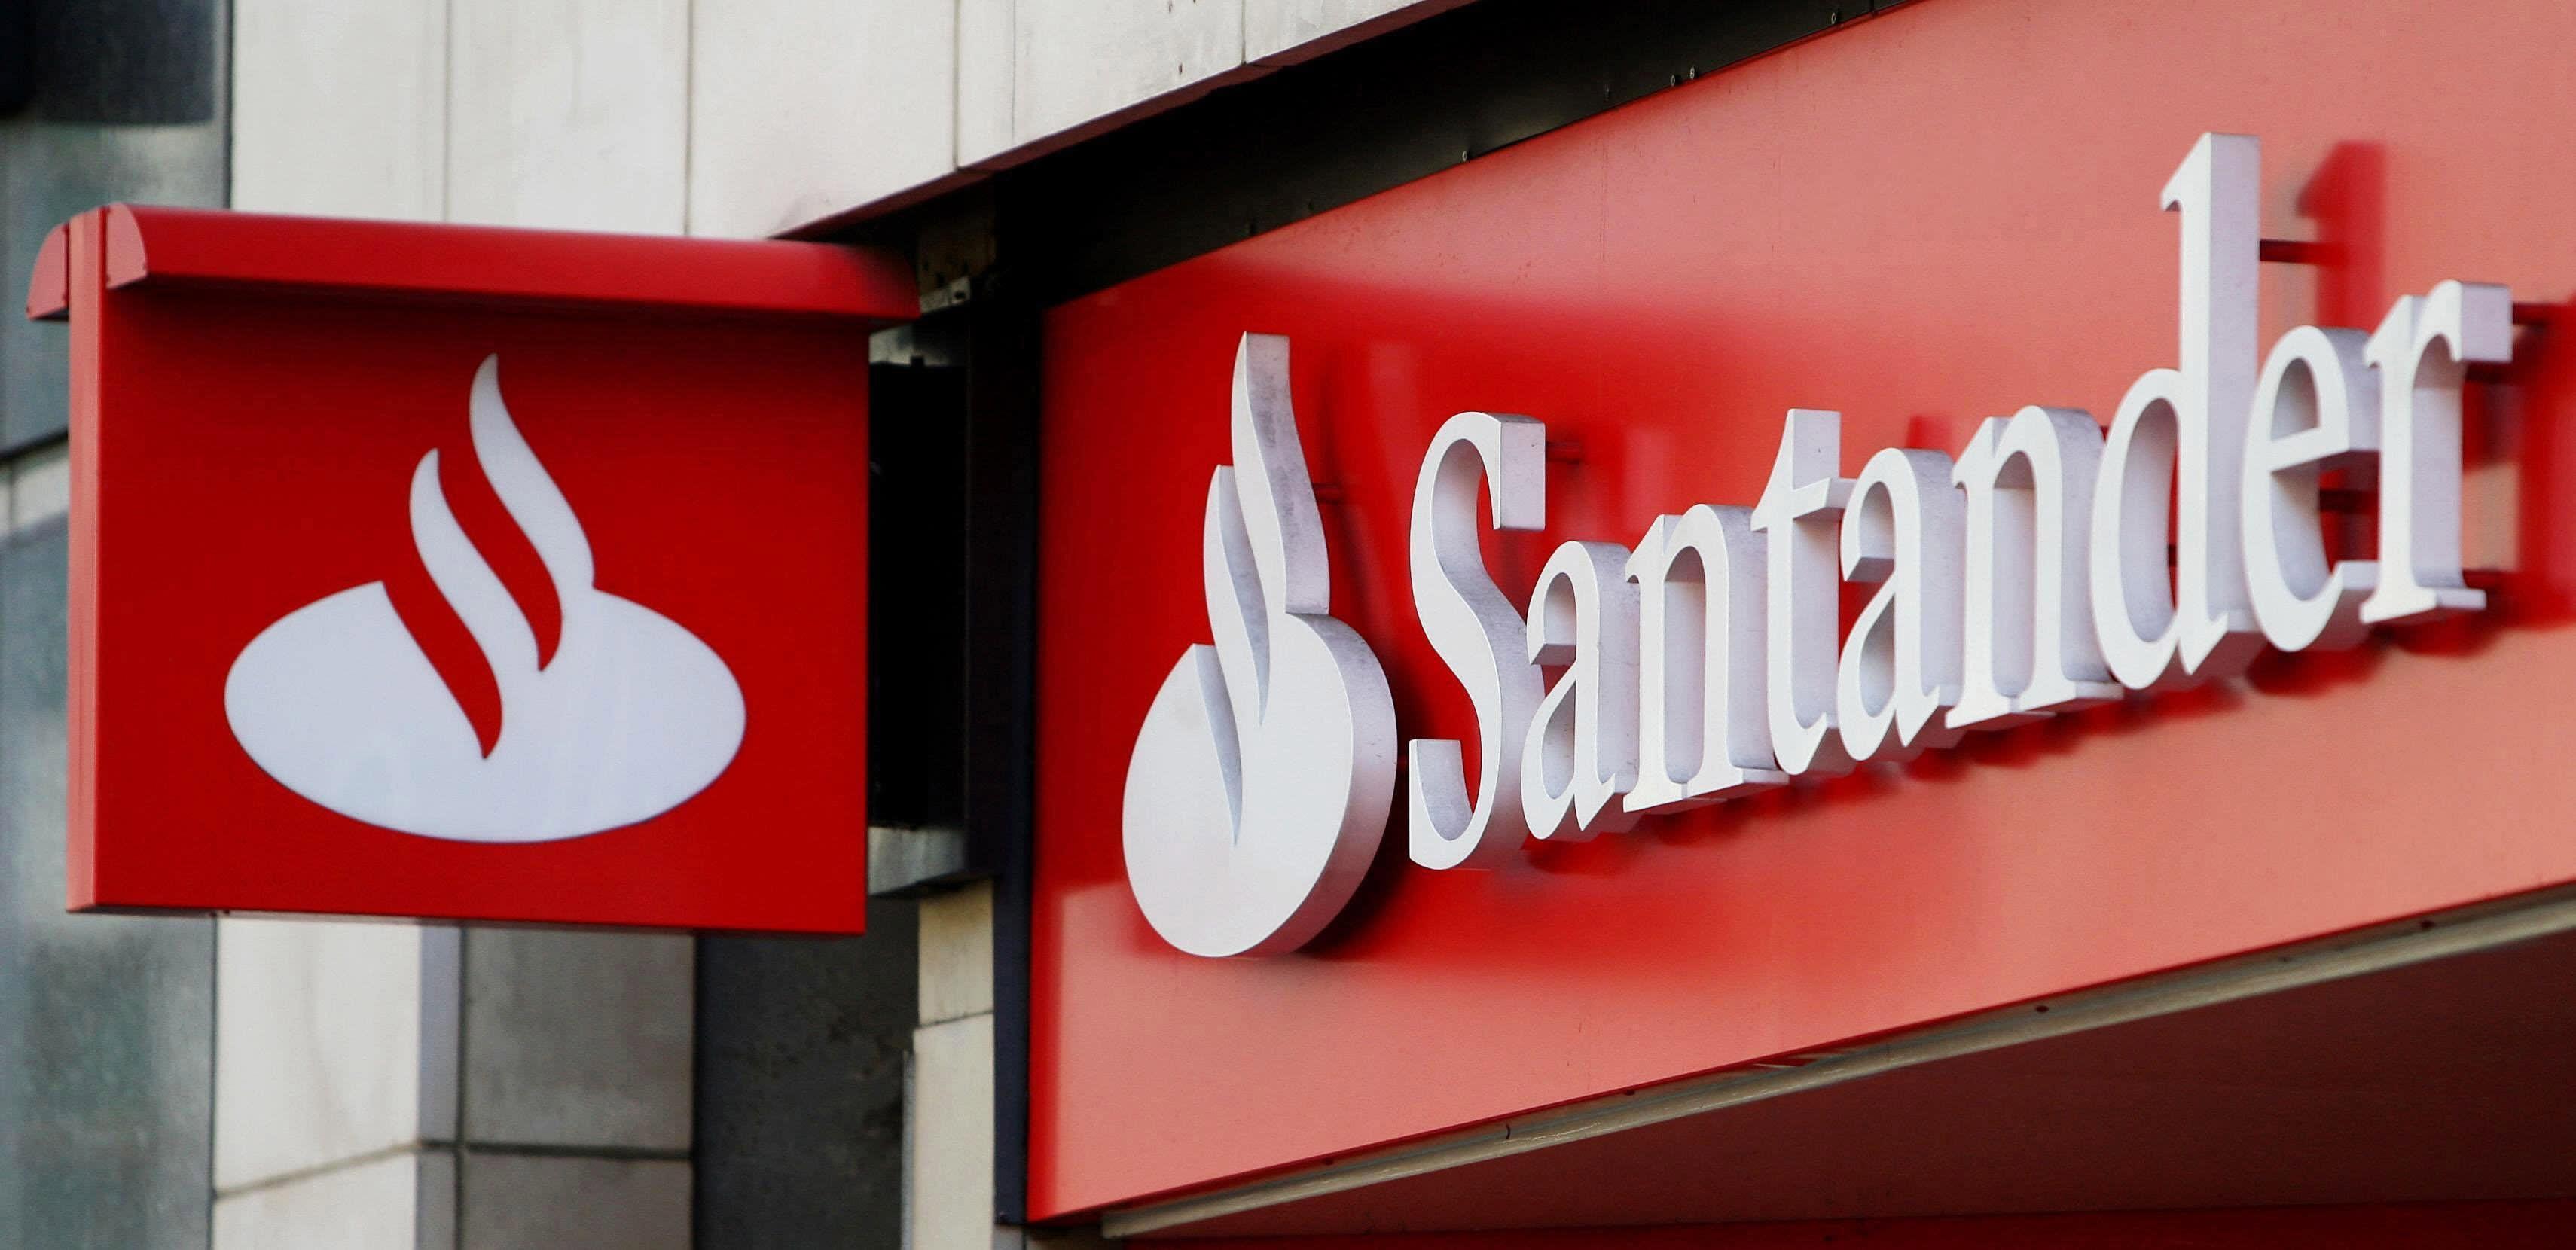 Santander sees modest growth on mortgage lending